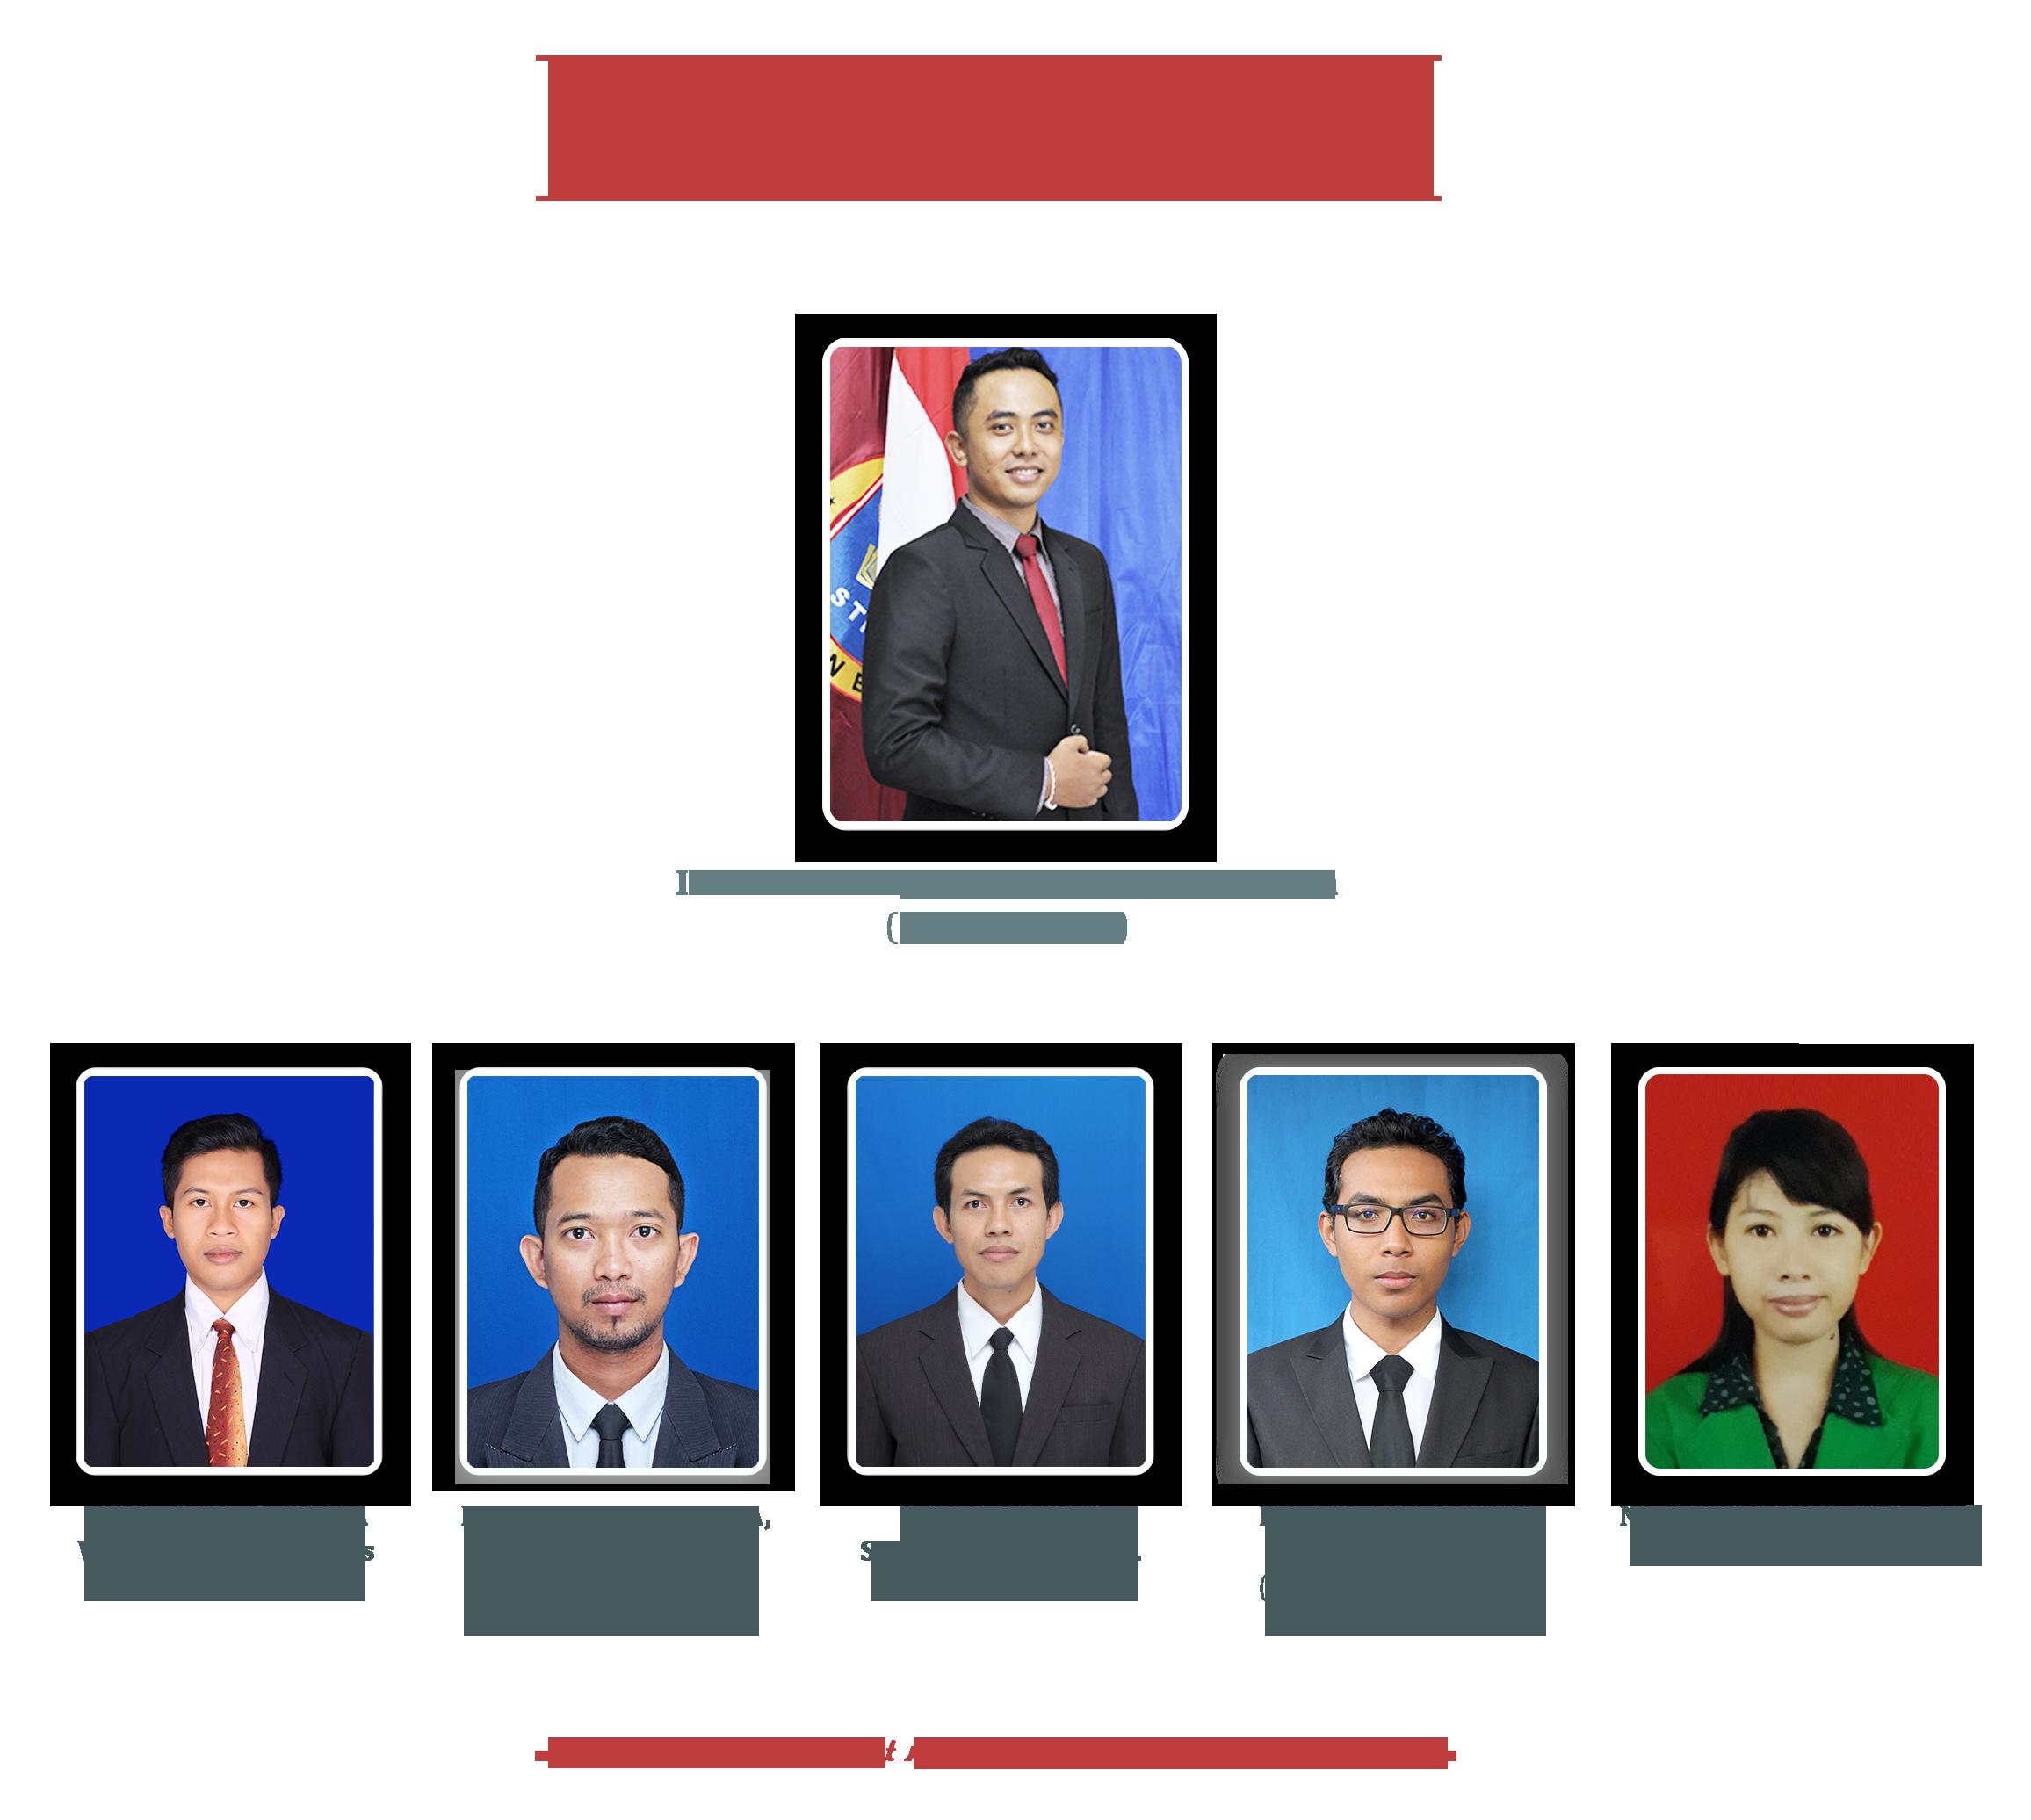 Struktur Organisasi LPPM STMIK STIKOM Indonesia